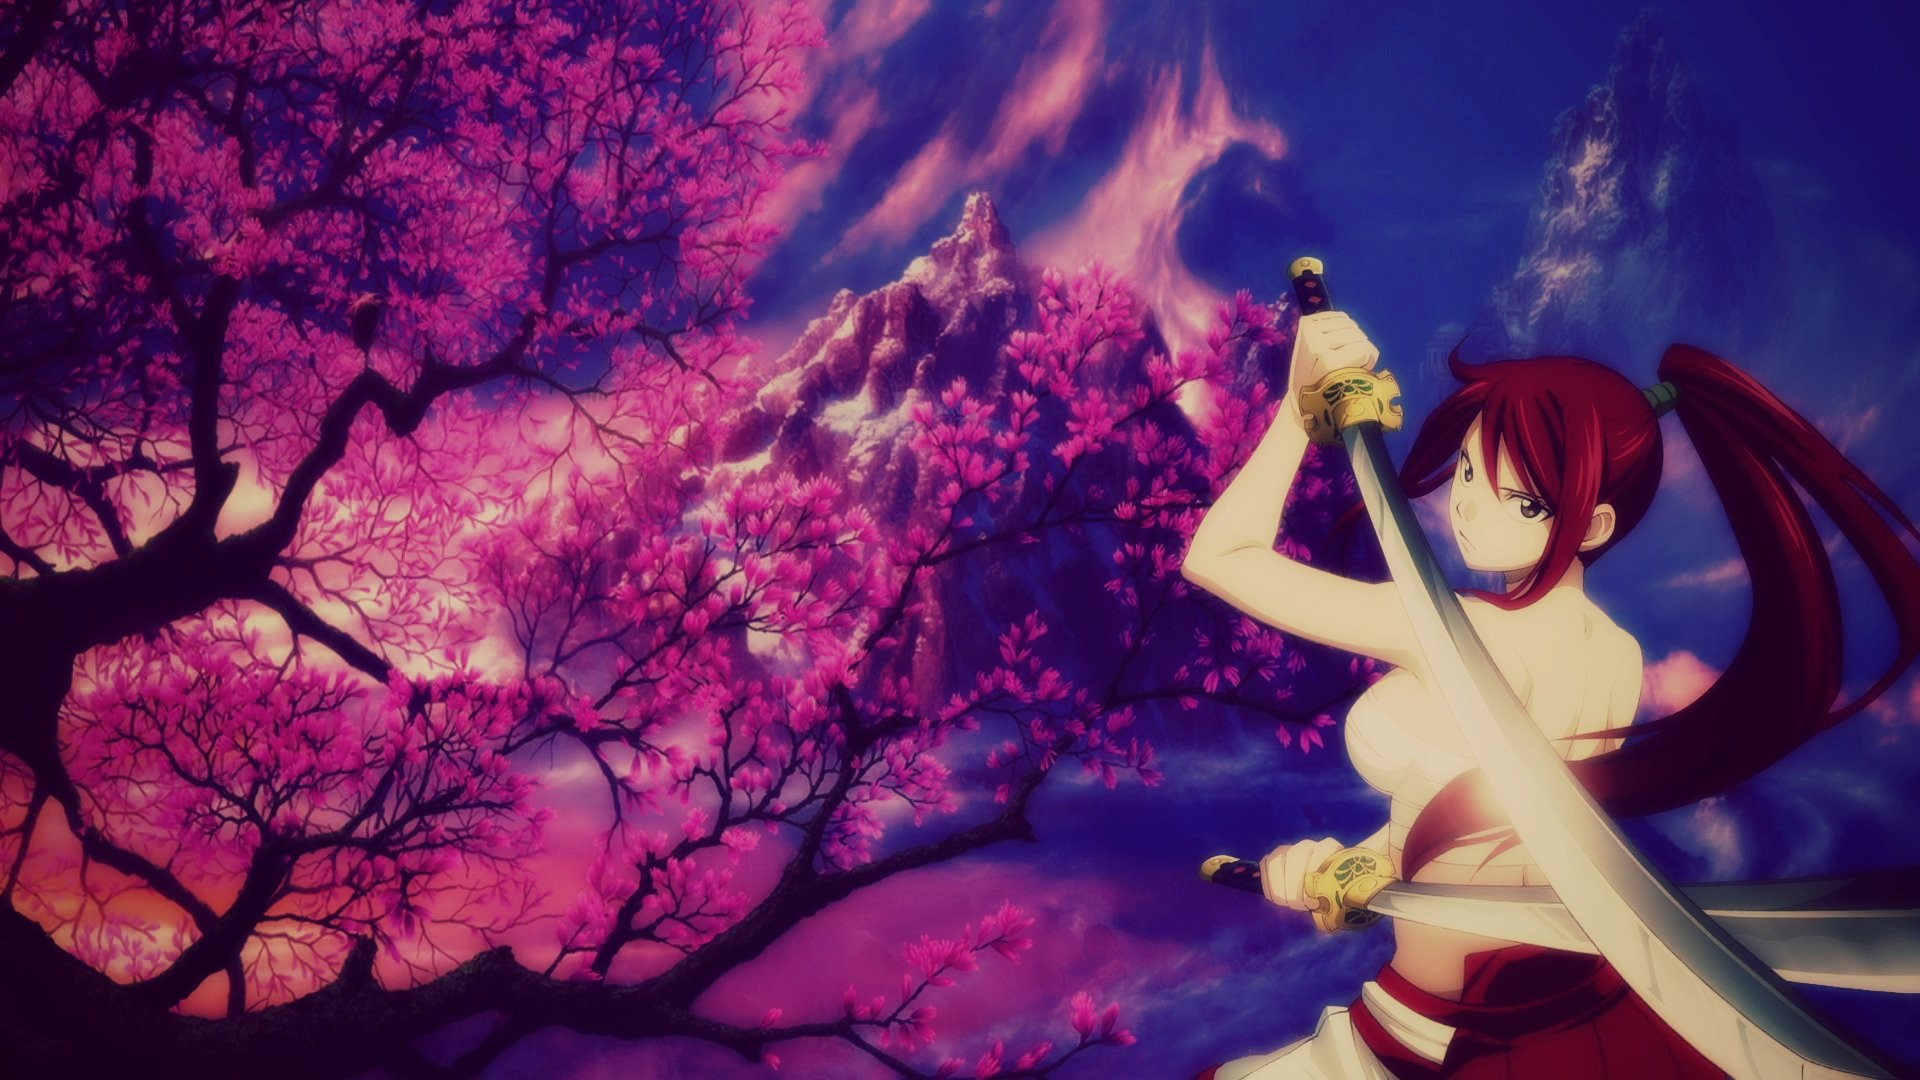 Anime – Fairy Tail Erza Scarlet Sword Girl Anime Wallpaper